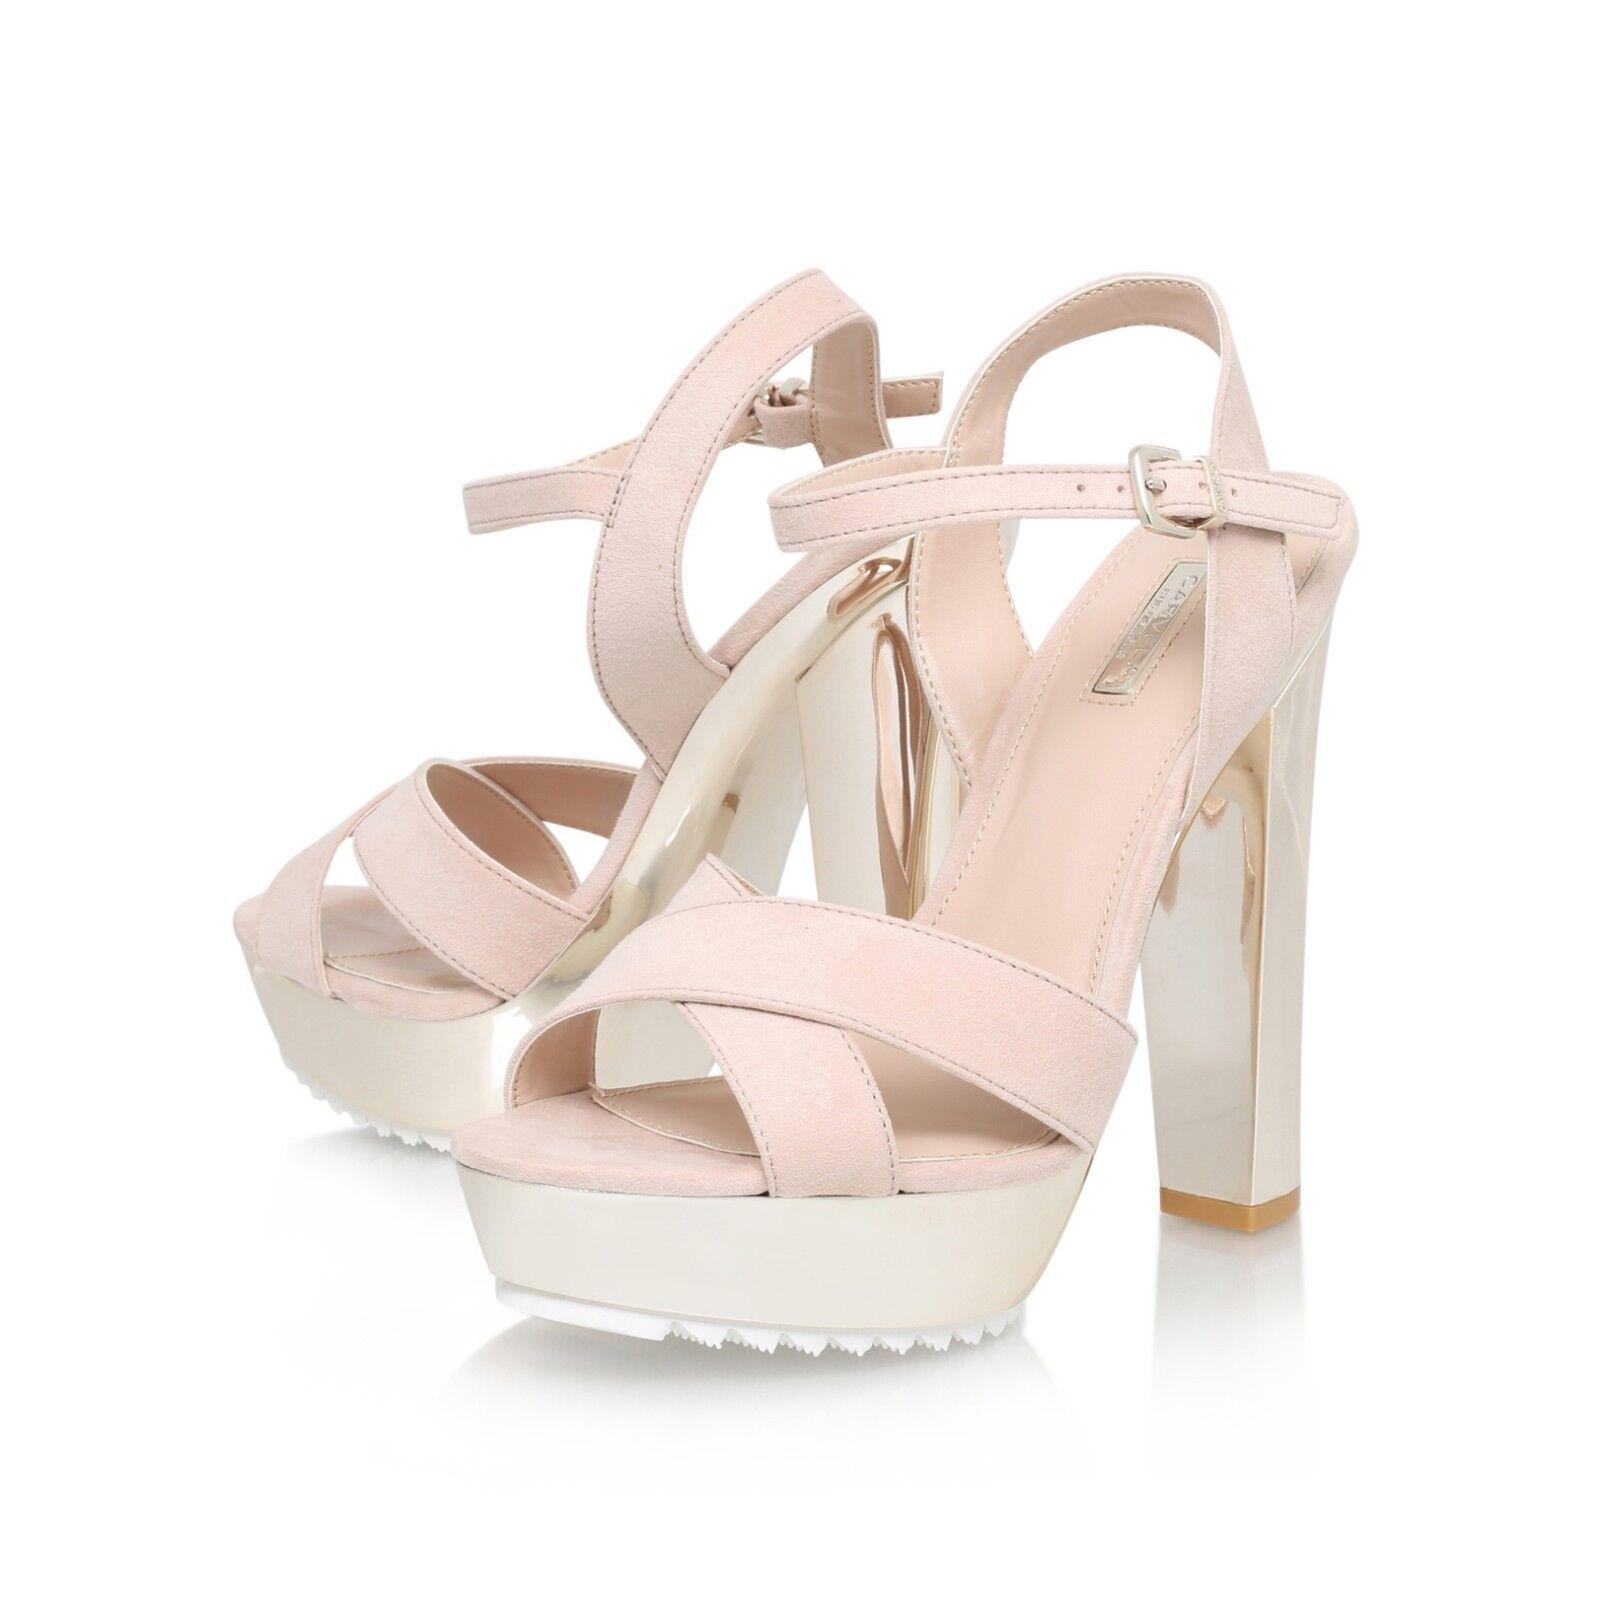 Carvela Kurt Geiger Gone Chunky Chunky Chunky gold Heeled Sandals Size 4 37 NEW   Nude 843290